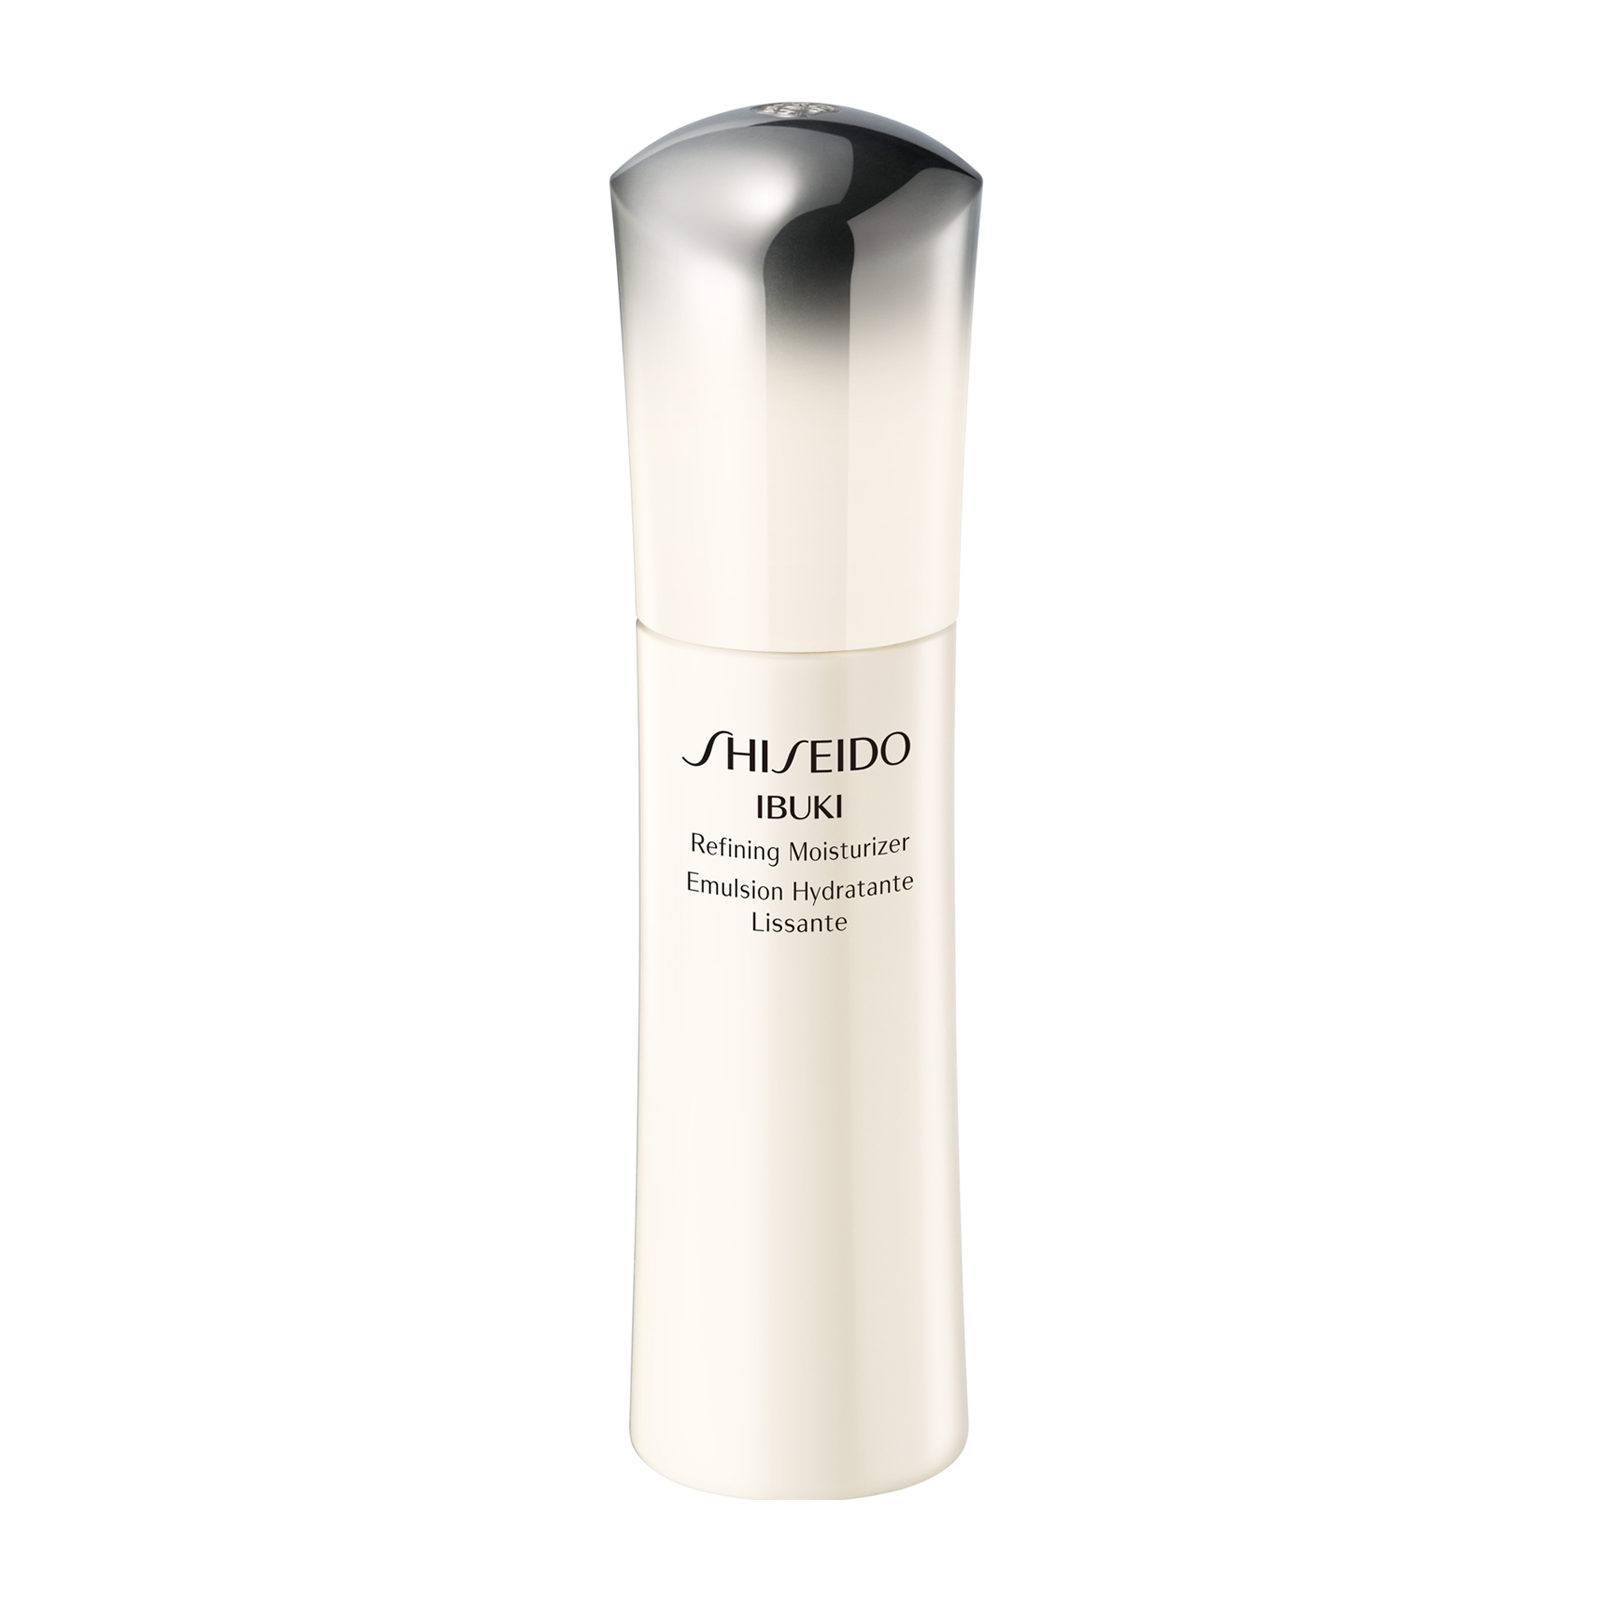 shiseido_ibuki_refining_moisturizer_75ml_1378378223.png